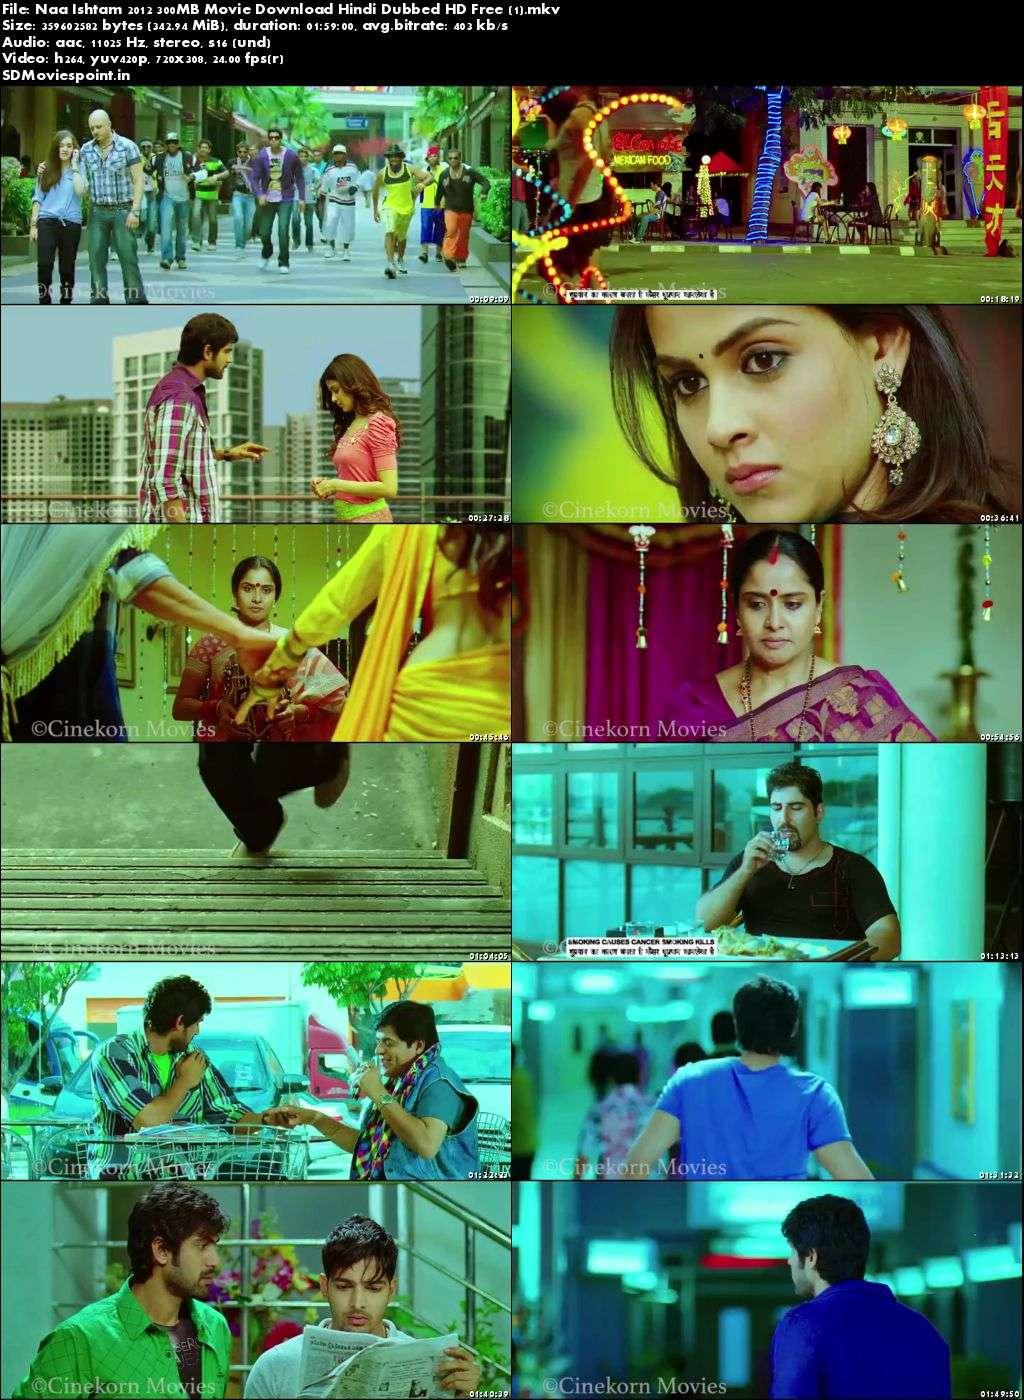 Screen Shots Naa Ishtam 2012 300MB Movie Download Hindi Dubbed HD Free